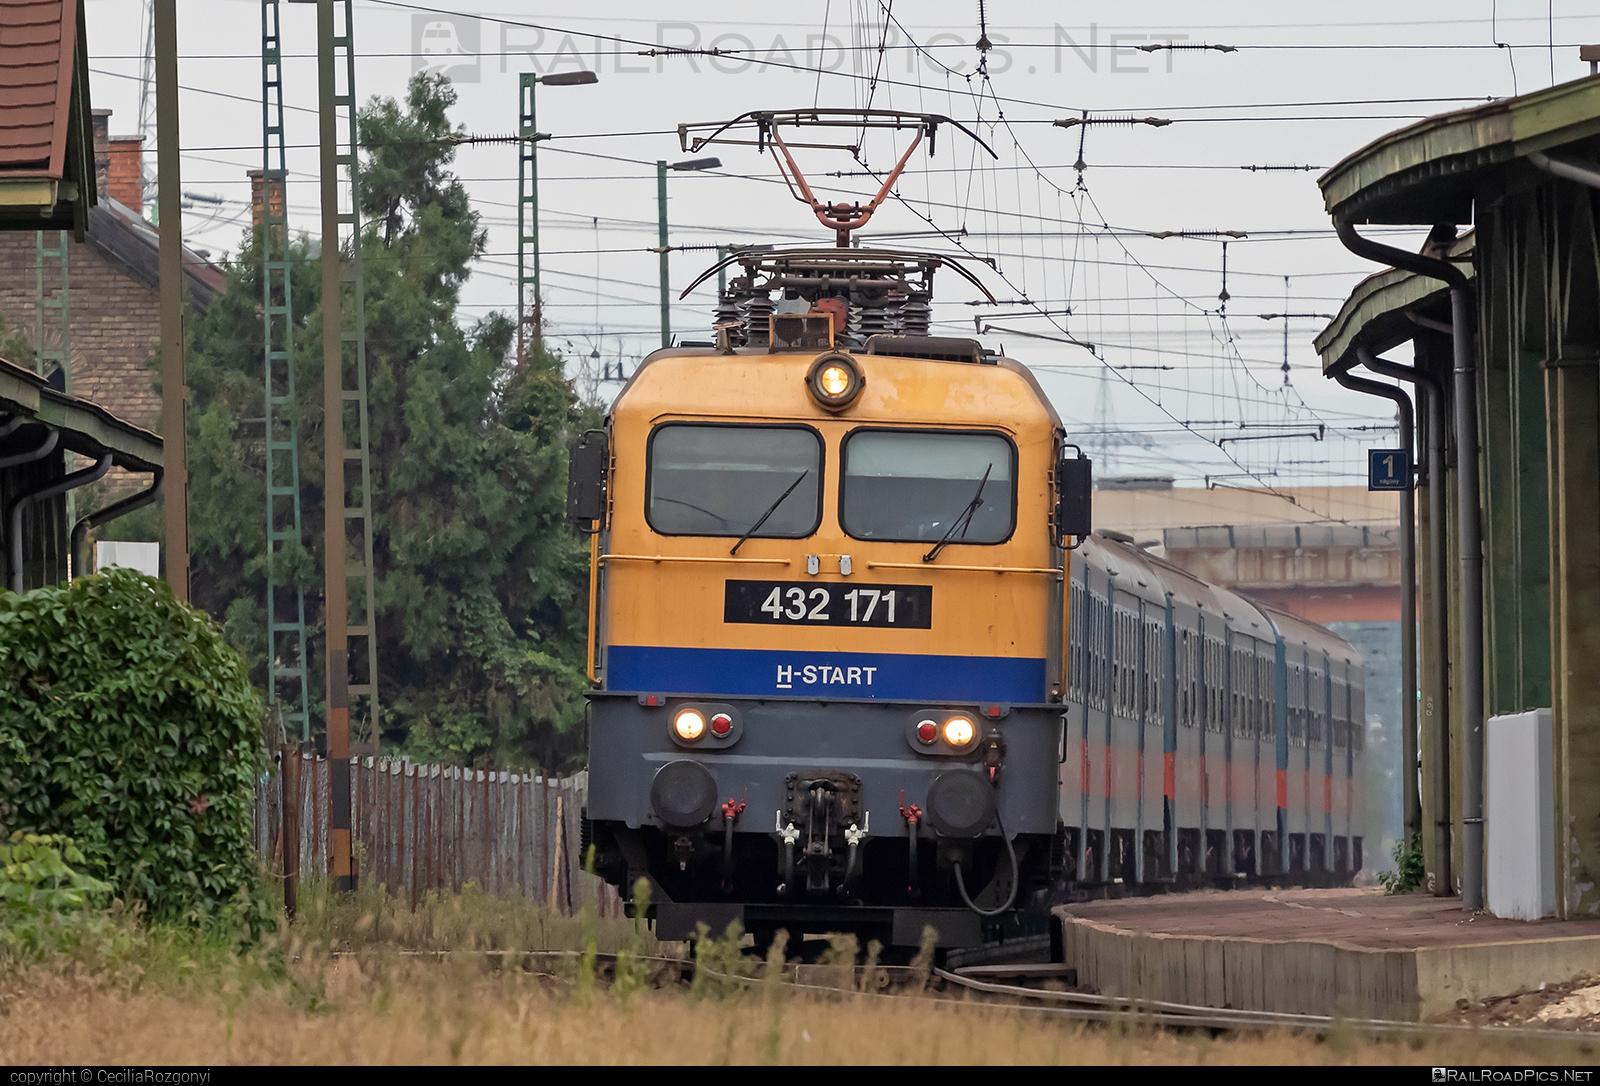 Ganz-MÁVAG VM14-15 - 432 171 operated by MÁV-START ZRt. #ganz43 #ganz431 #ganzmavag #ganzmavag43 #ganzmavag431 #ganzmavagvm1415 #mav #v43locomotive